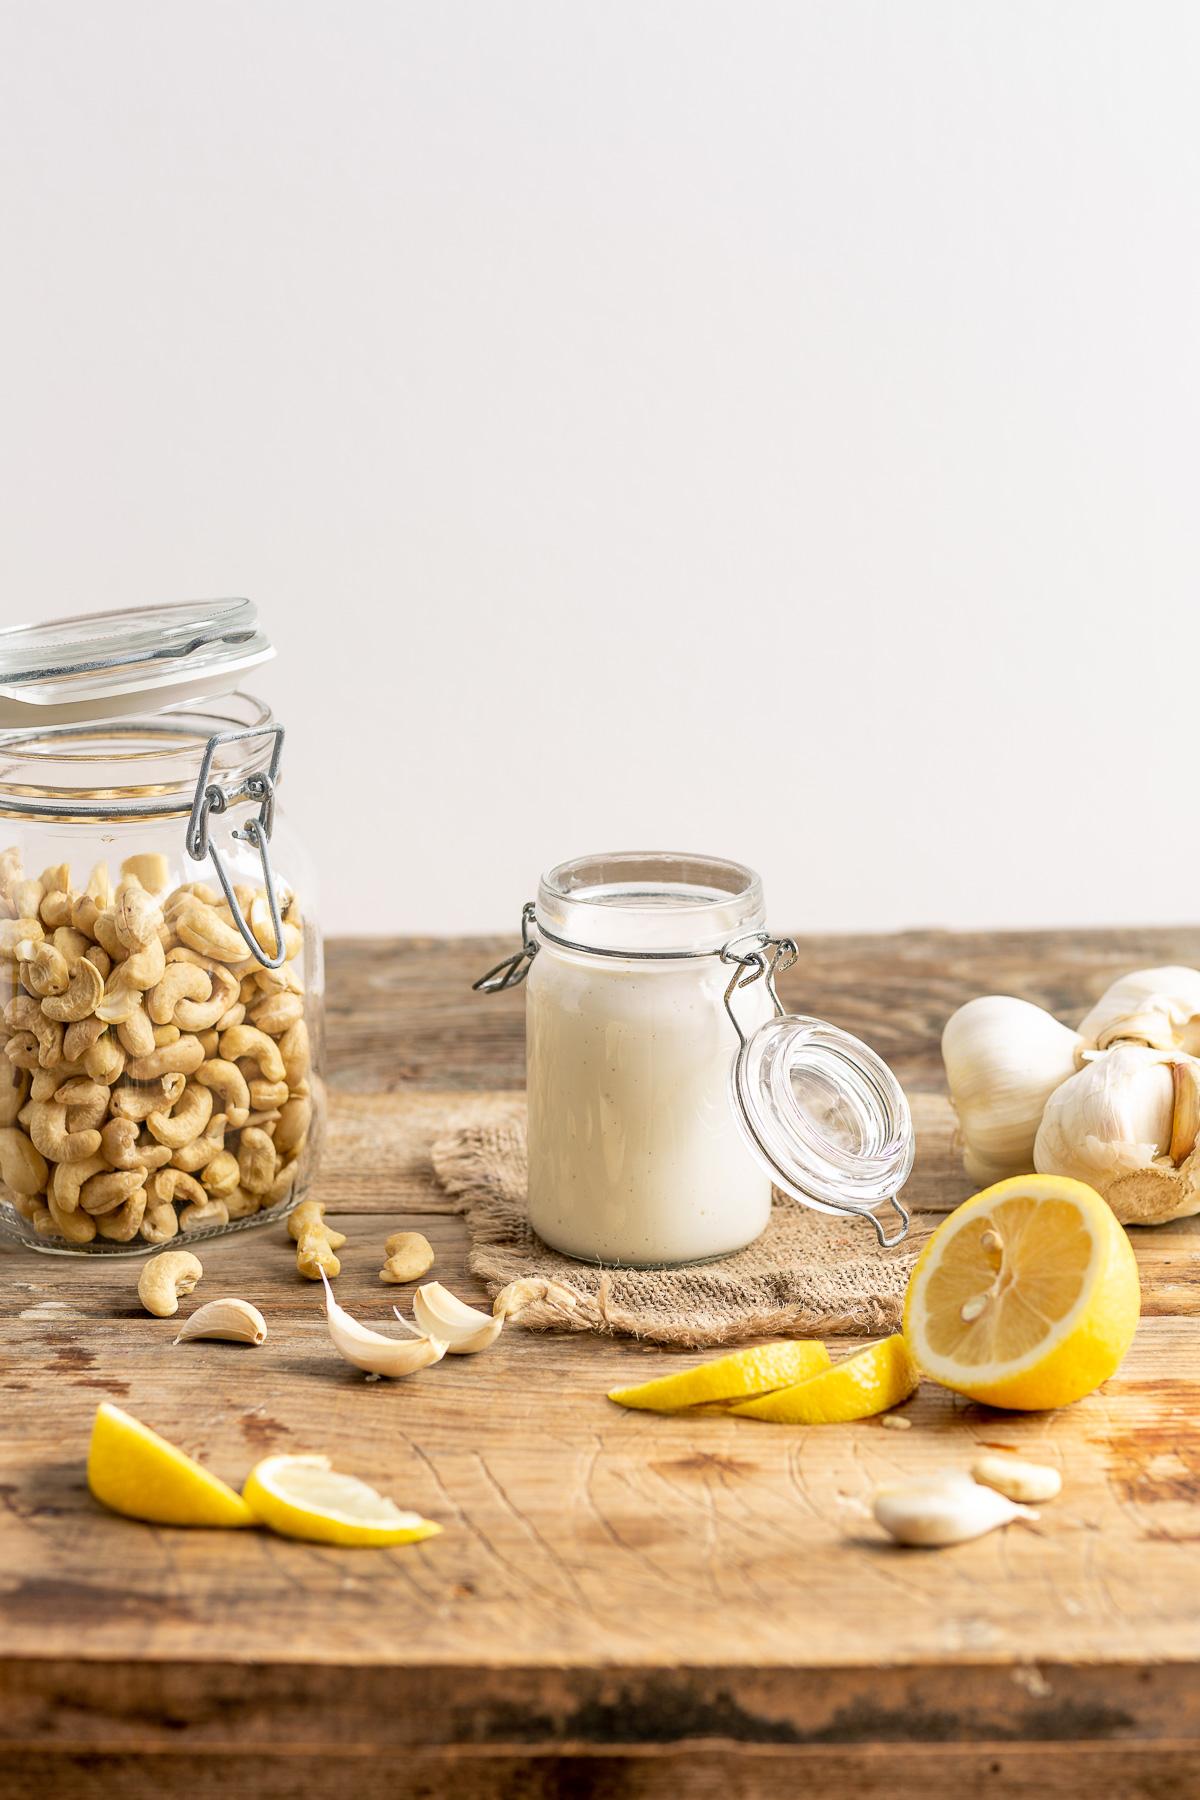 creamy VEGAN CASHEW AIOLI recipe egg-free paleo ricetta cremosa salsa aioli di anacardi senza uova vegan